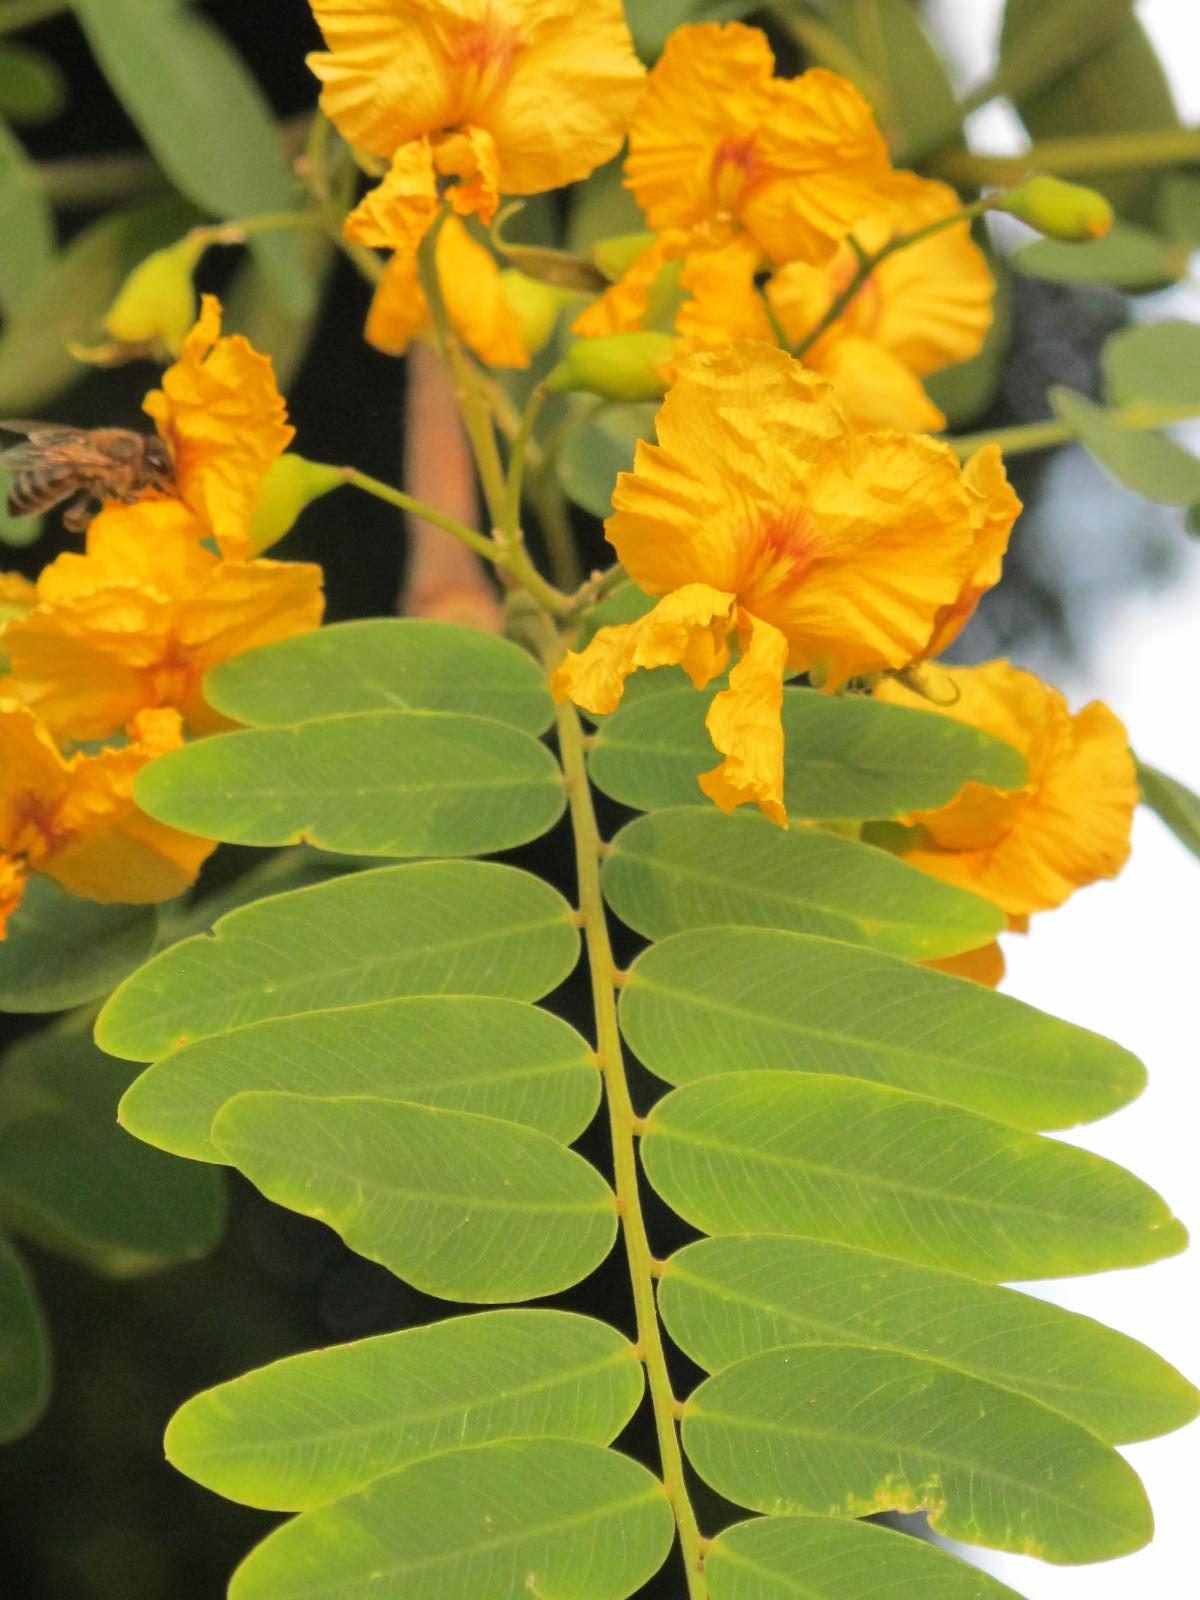 The Flowering plants  Leguminosae  Fabaceae Fabaceae  Tipuana tipu